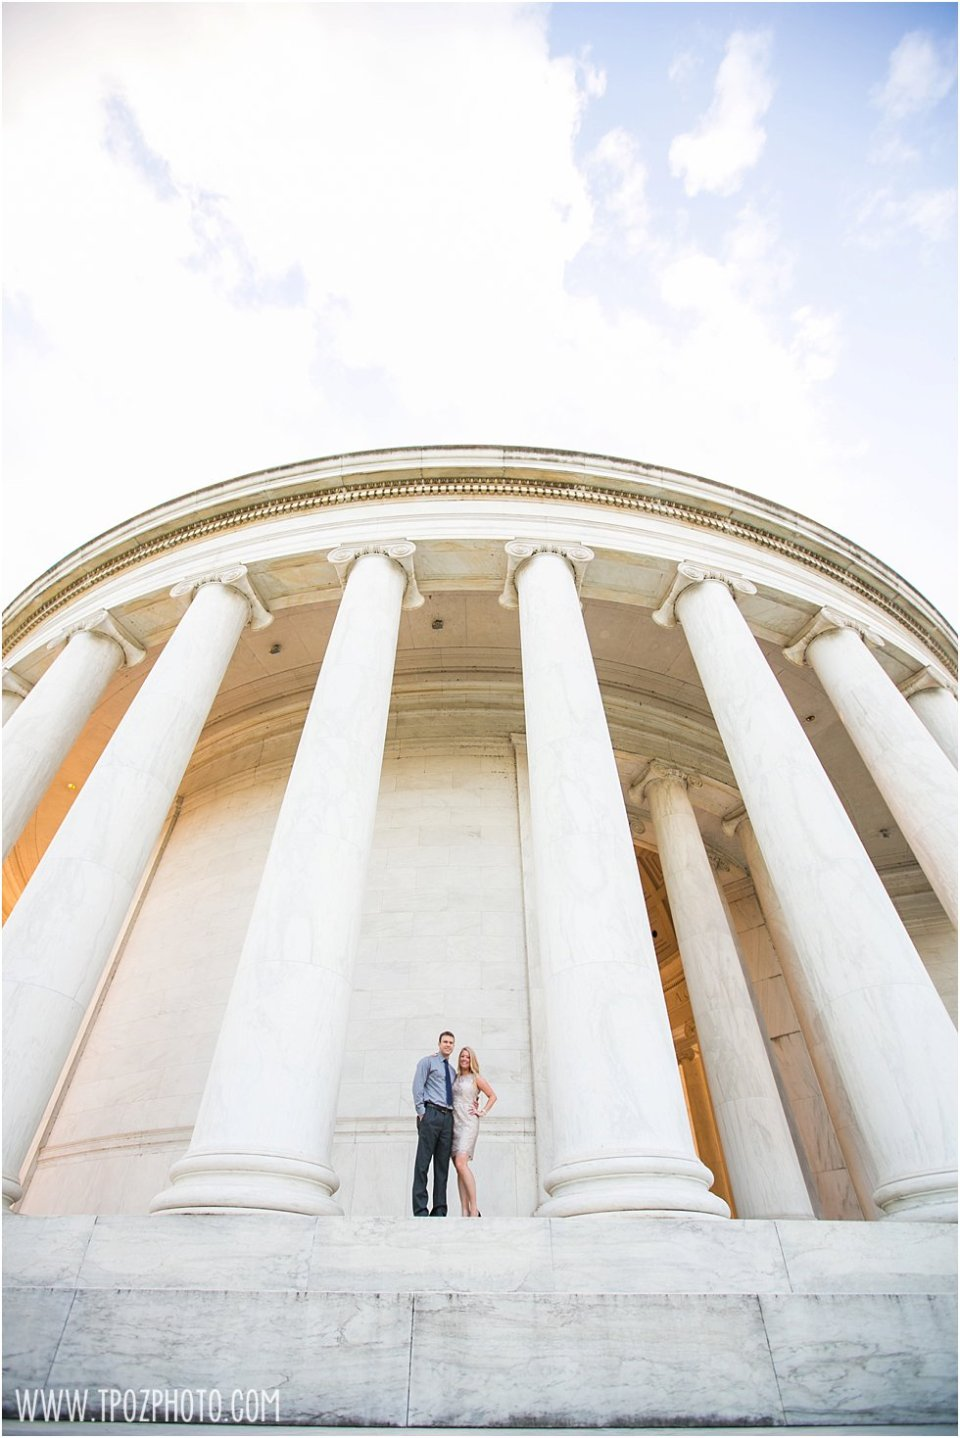 DC Engagement Photos  •  tPoz Photography  •  www.tpozphoto.com